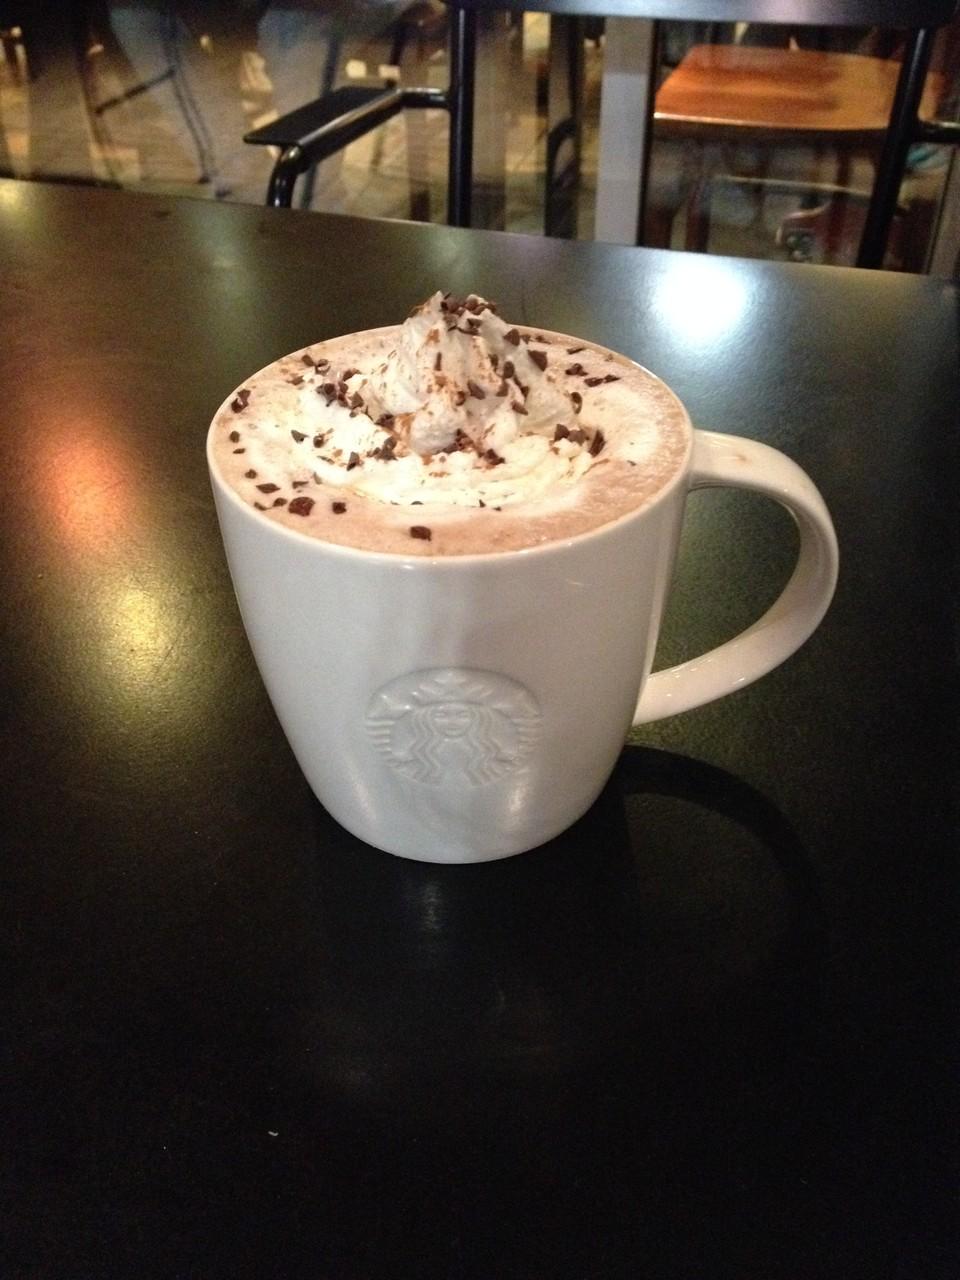 Peppermint Mocha at Starbucks